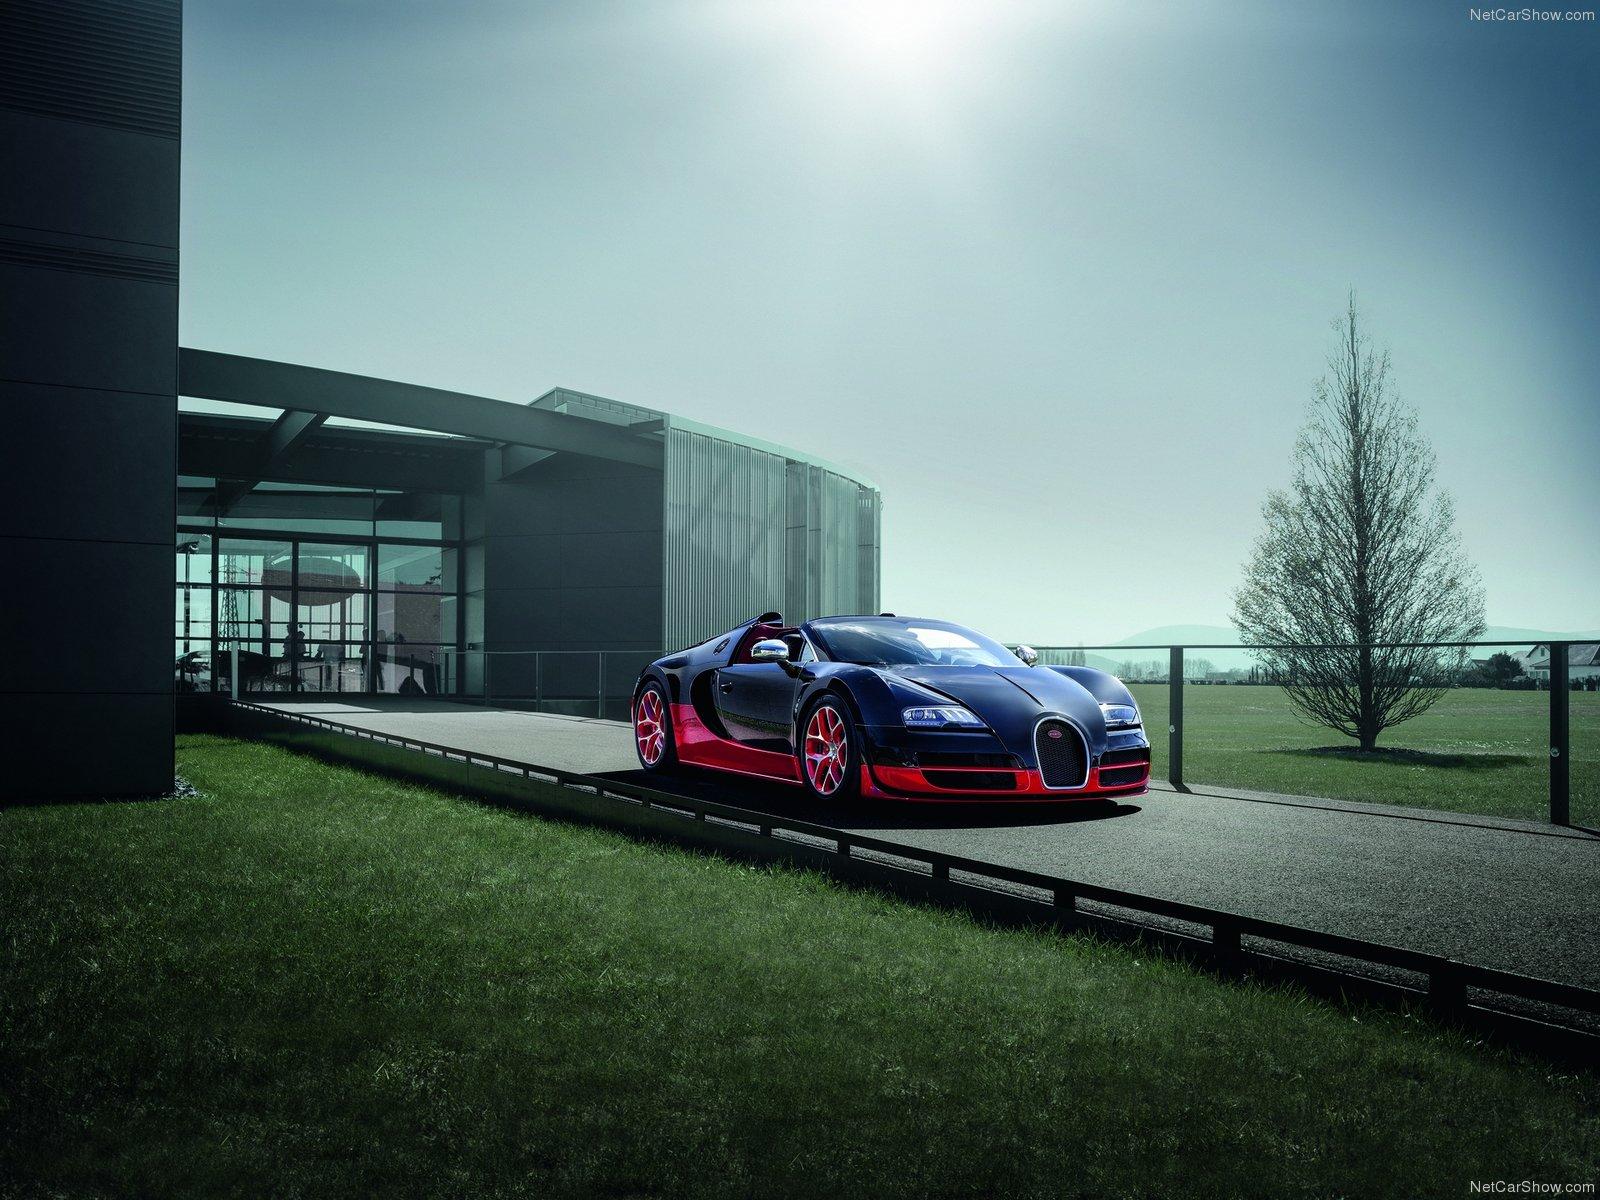 2012%2BBugatti%2BVeyron%2BGrand%2BSport%2BVitesse%2B%25282%2529 Astounding Xe Bugatti Veyron Grand Sport Vitesse Cars Trend